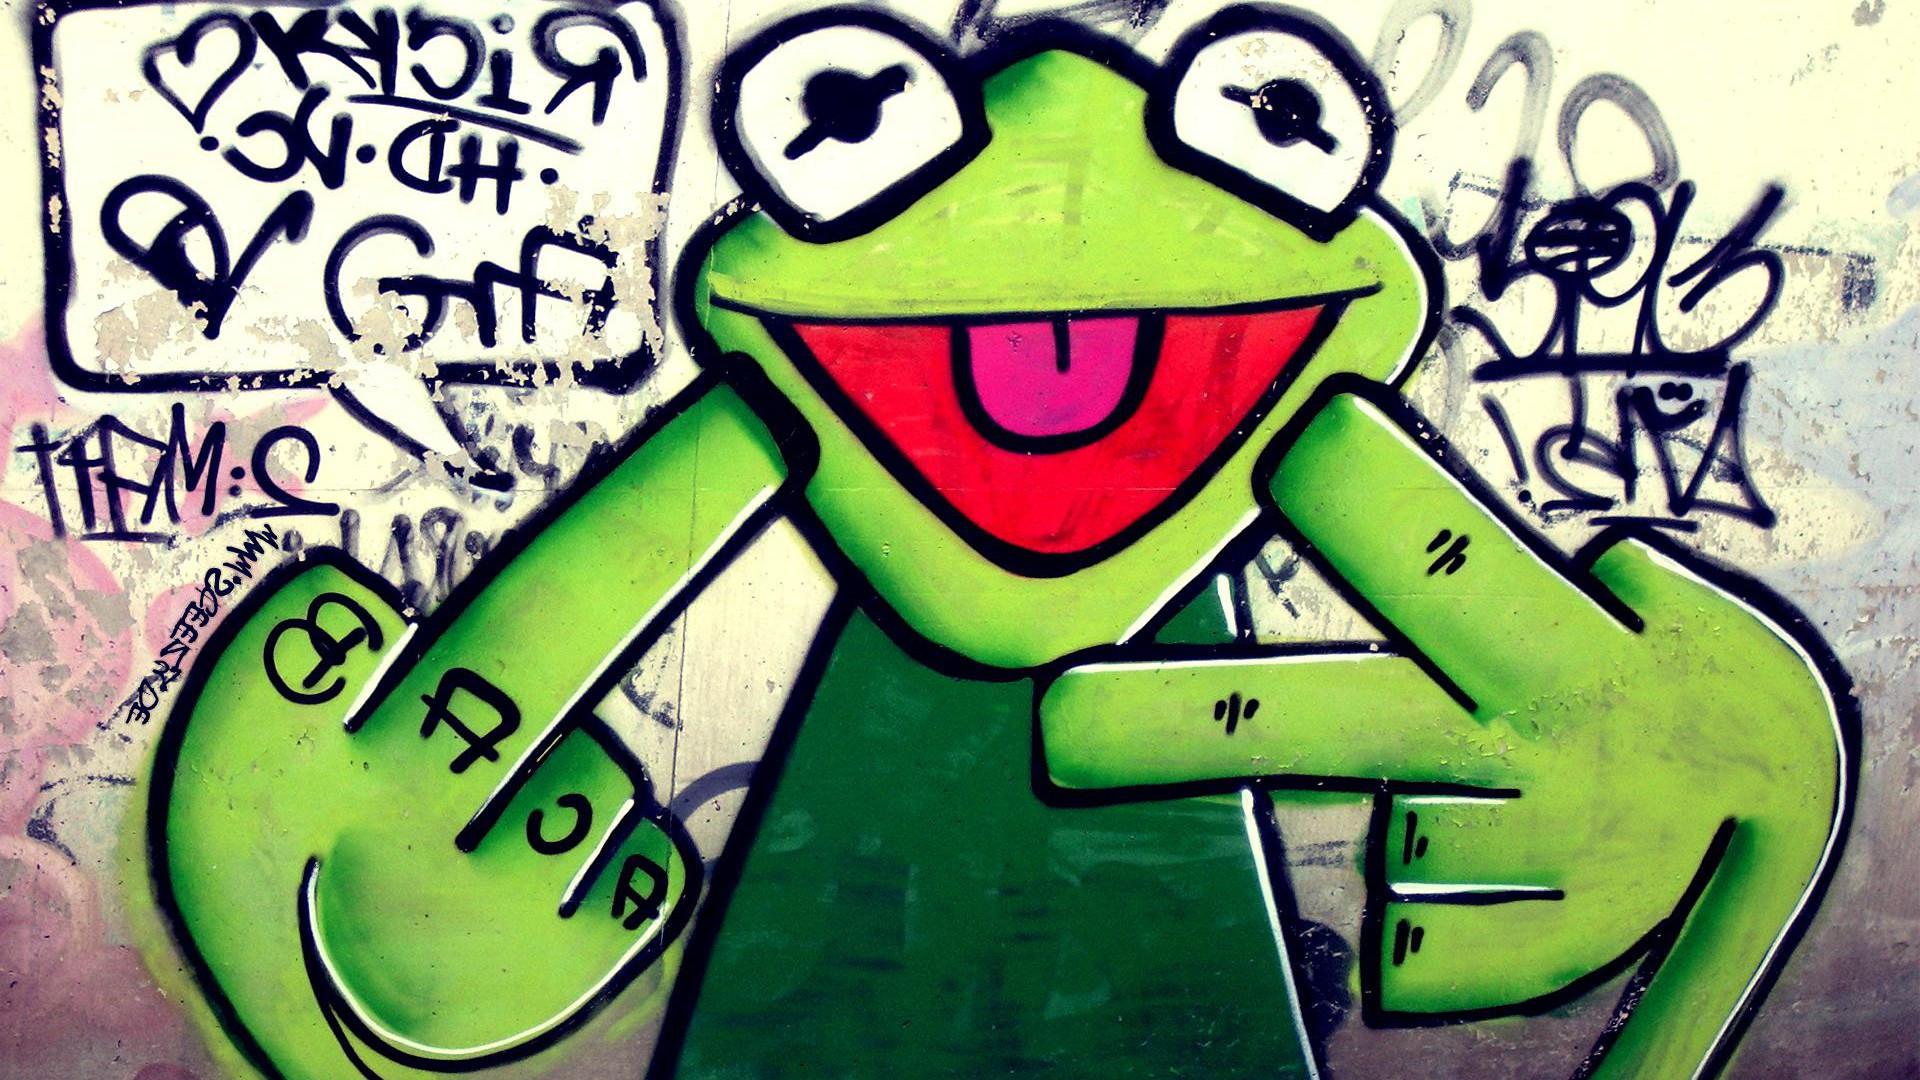 32+ Awesome Graffiti Wallpapers on WallpaperSafari